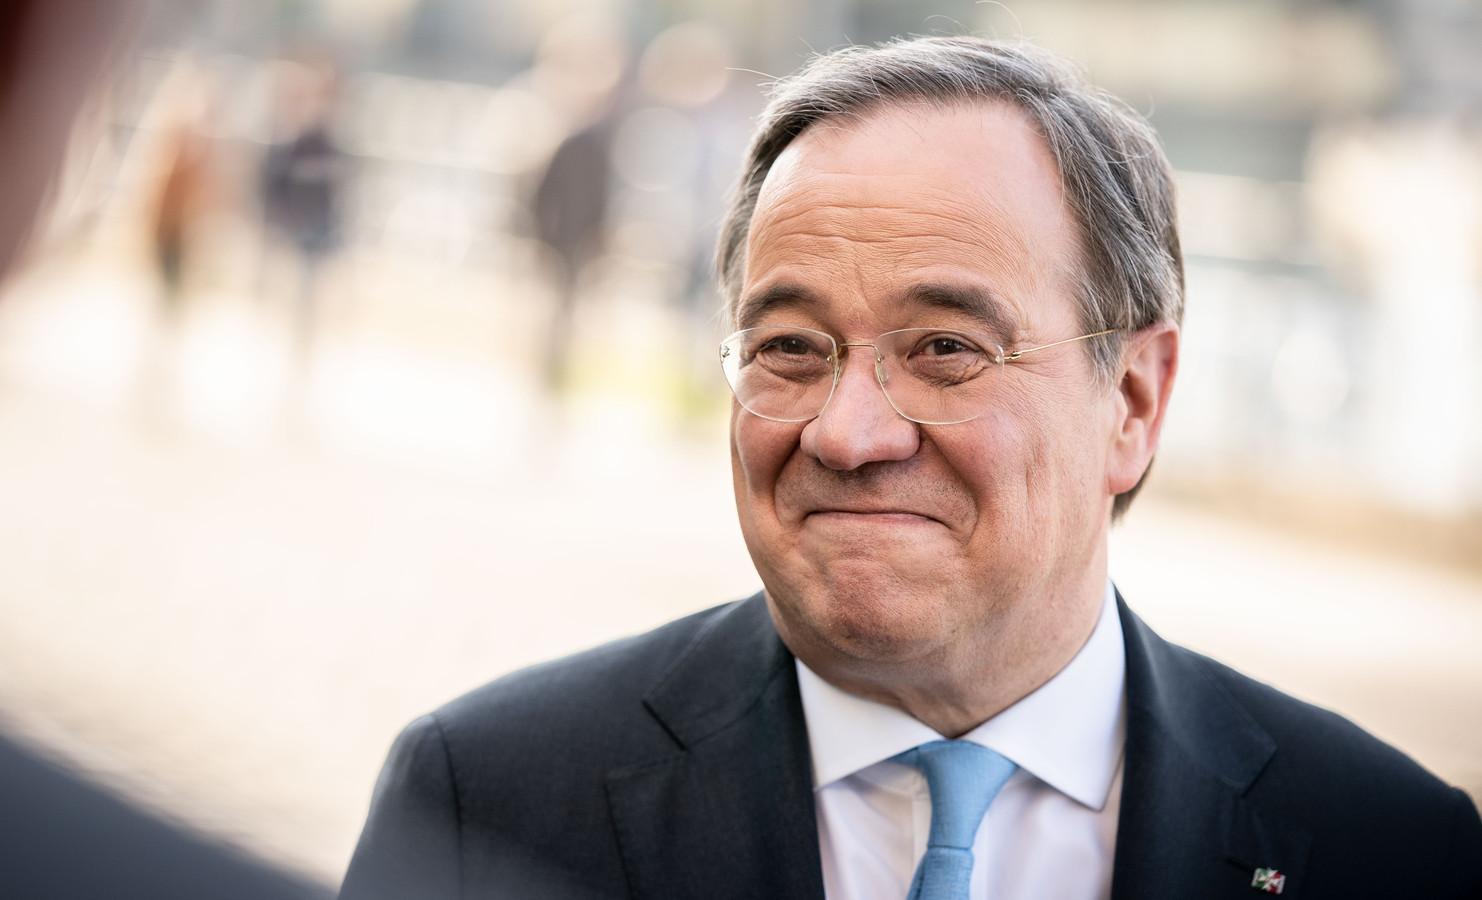 CDU-kanselierskandidaat Armin Laschet.